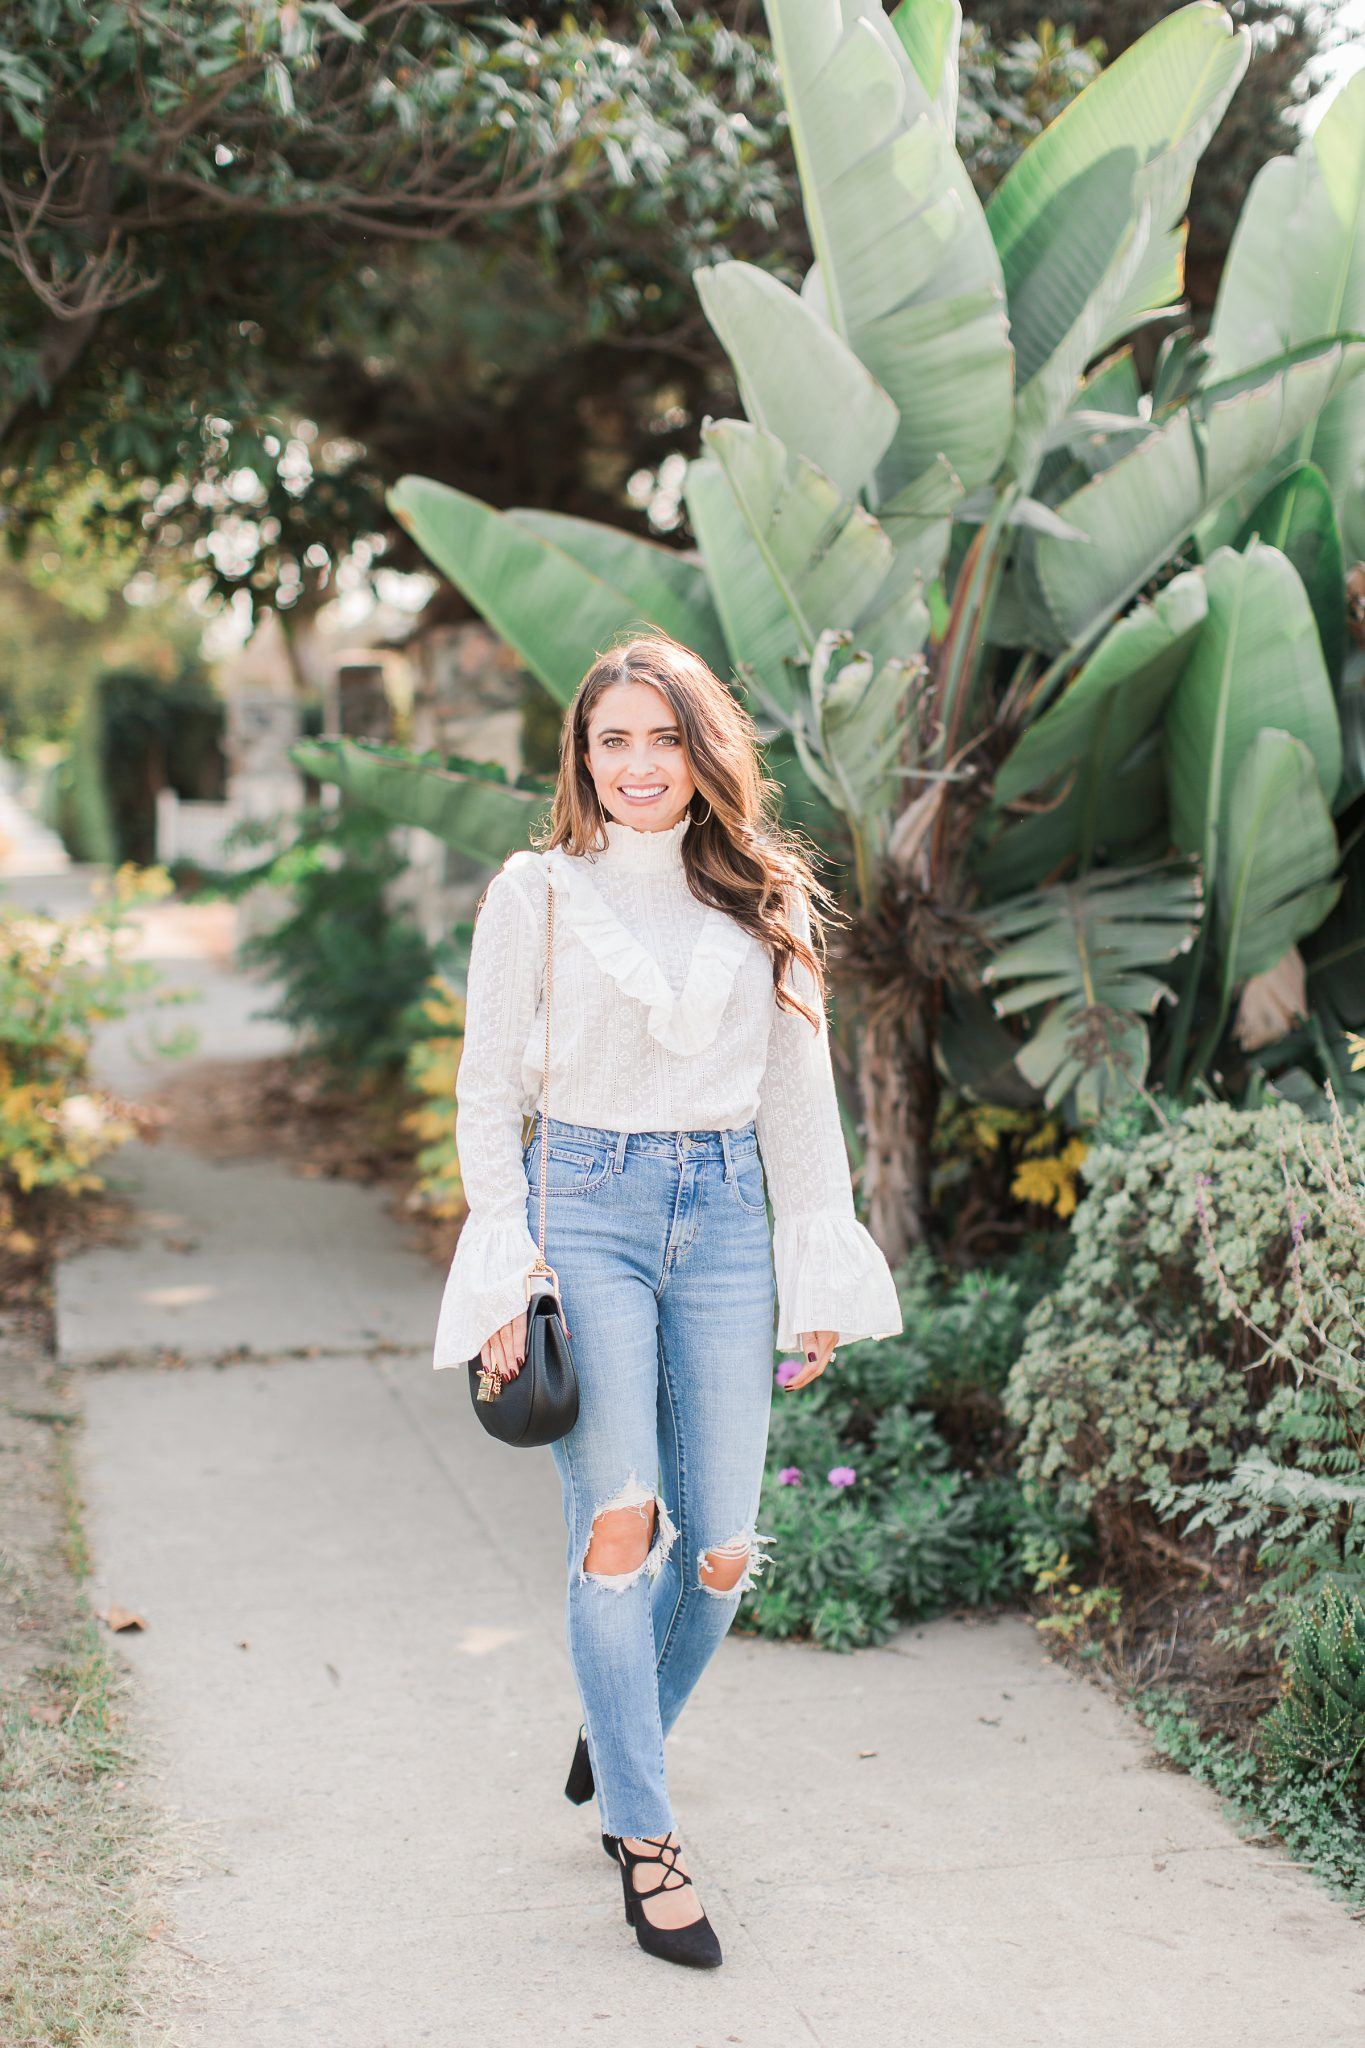 Maxie Elle | White lace top & distressed denim - Shopbop Sale Spring Picks featured by popular Orange County fashion blogger, Maxie Elle